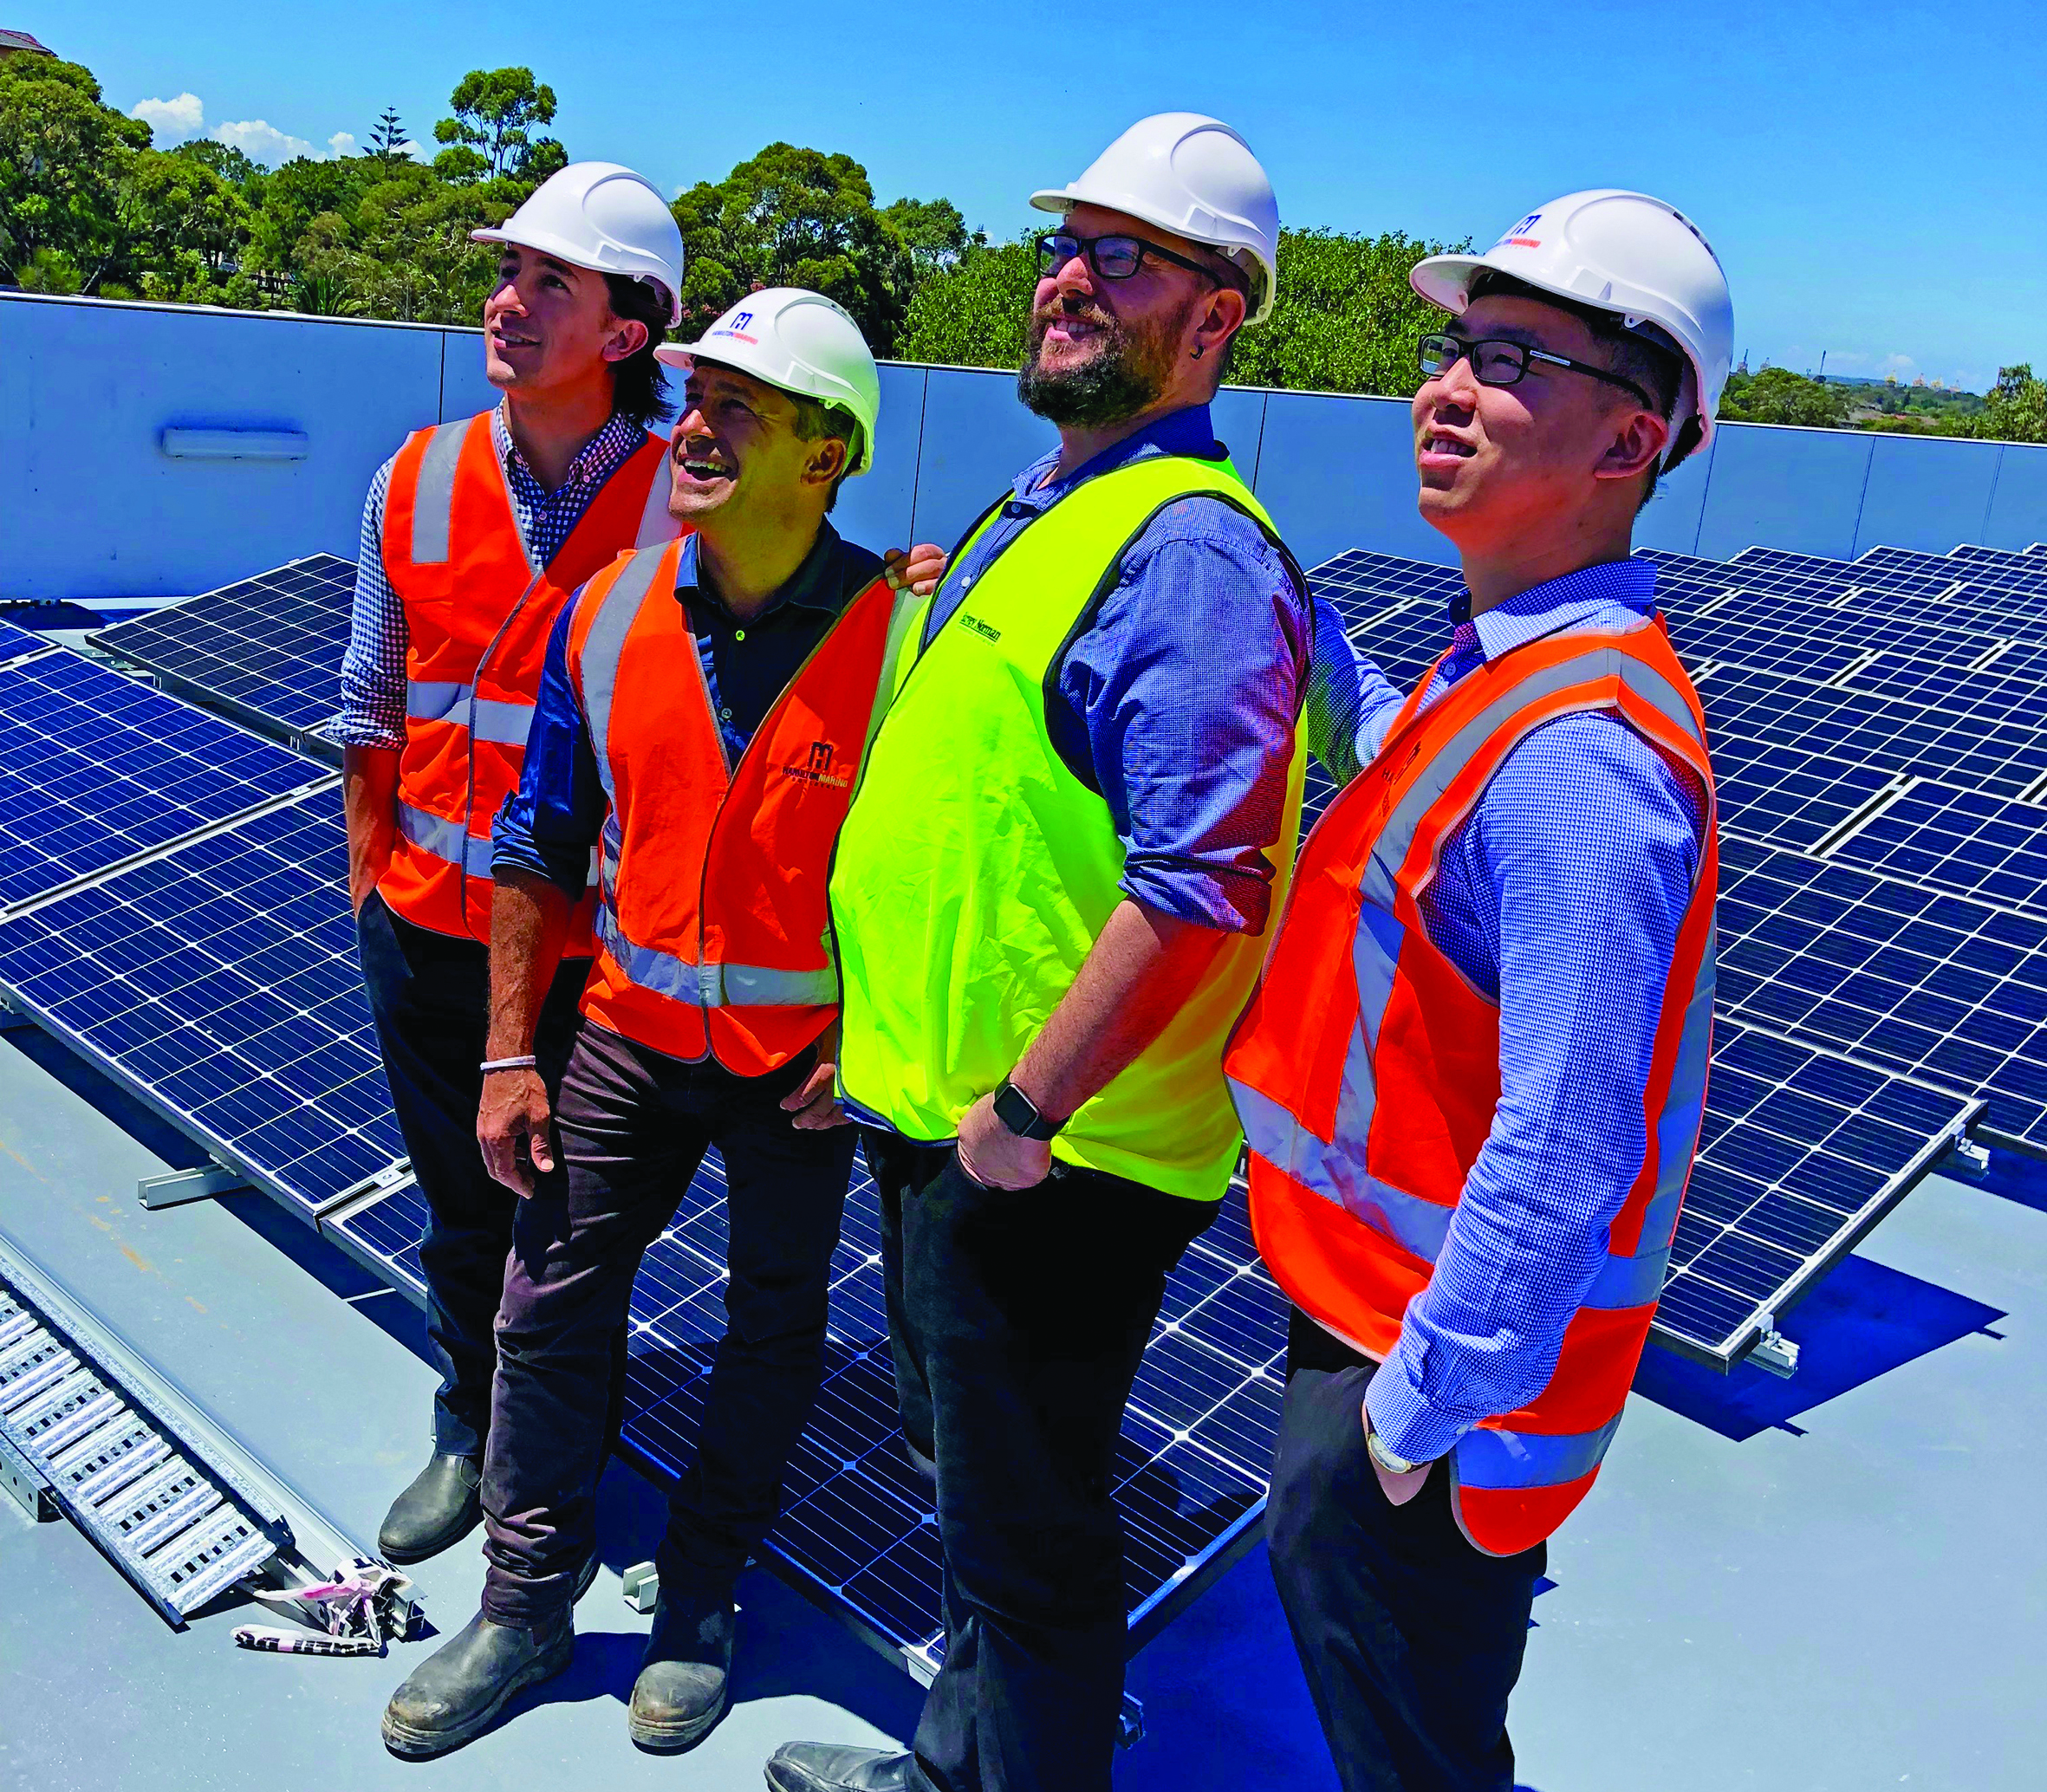 Burcham solar roof boys